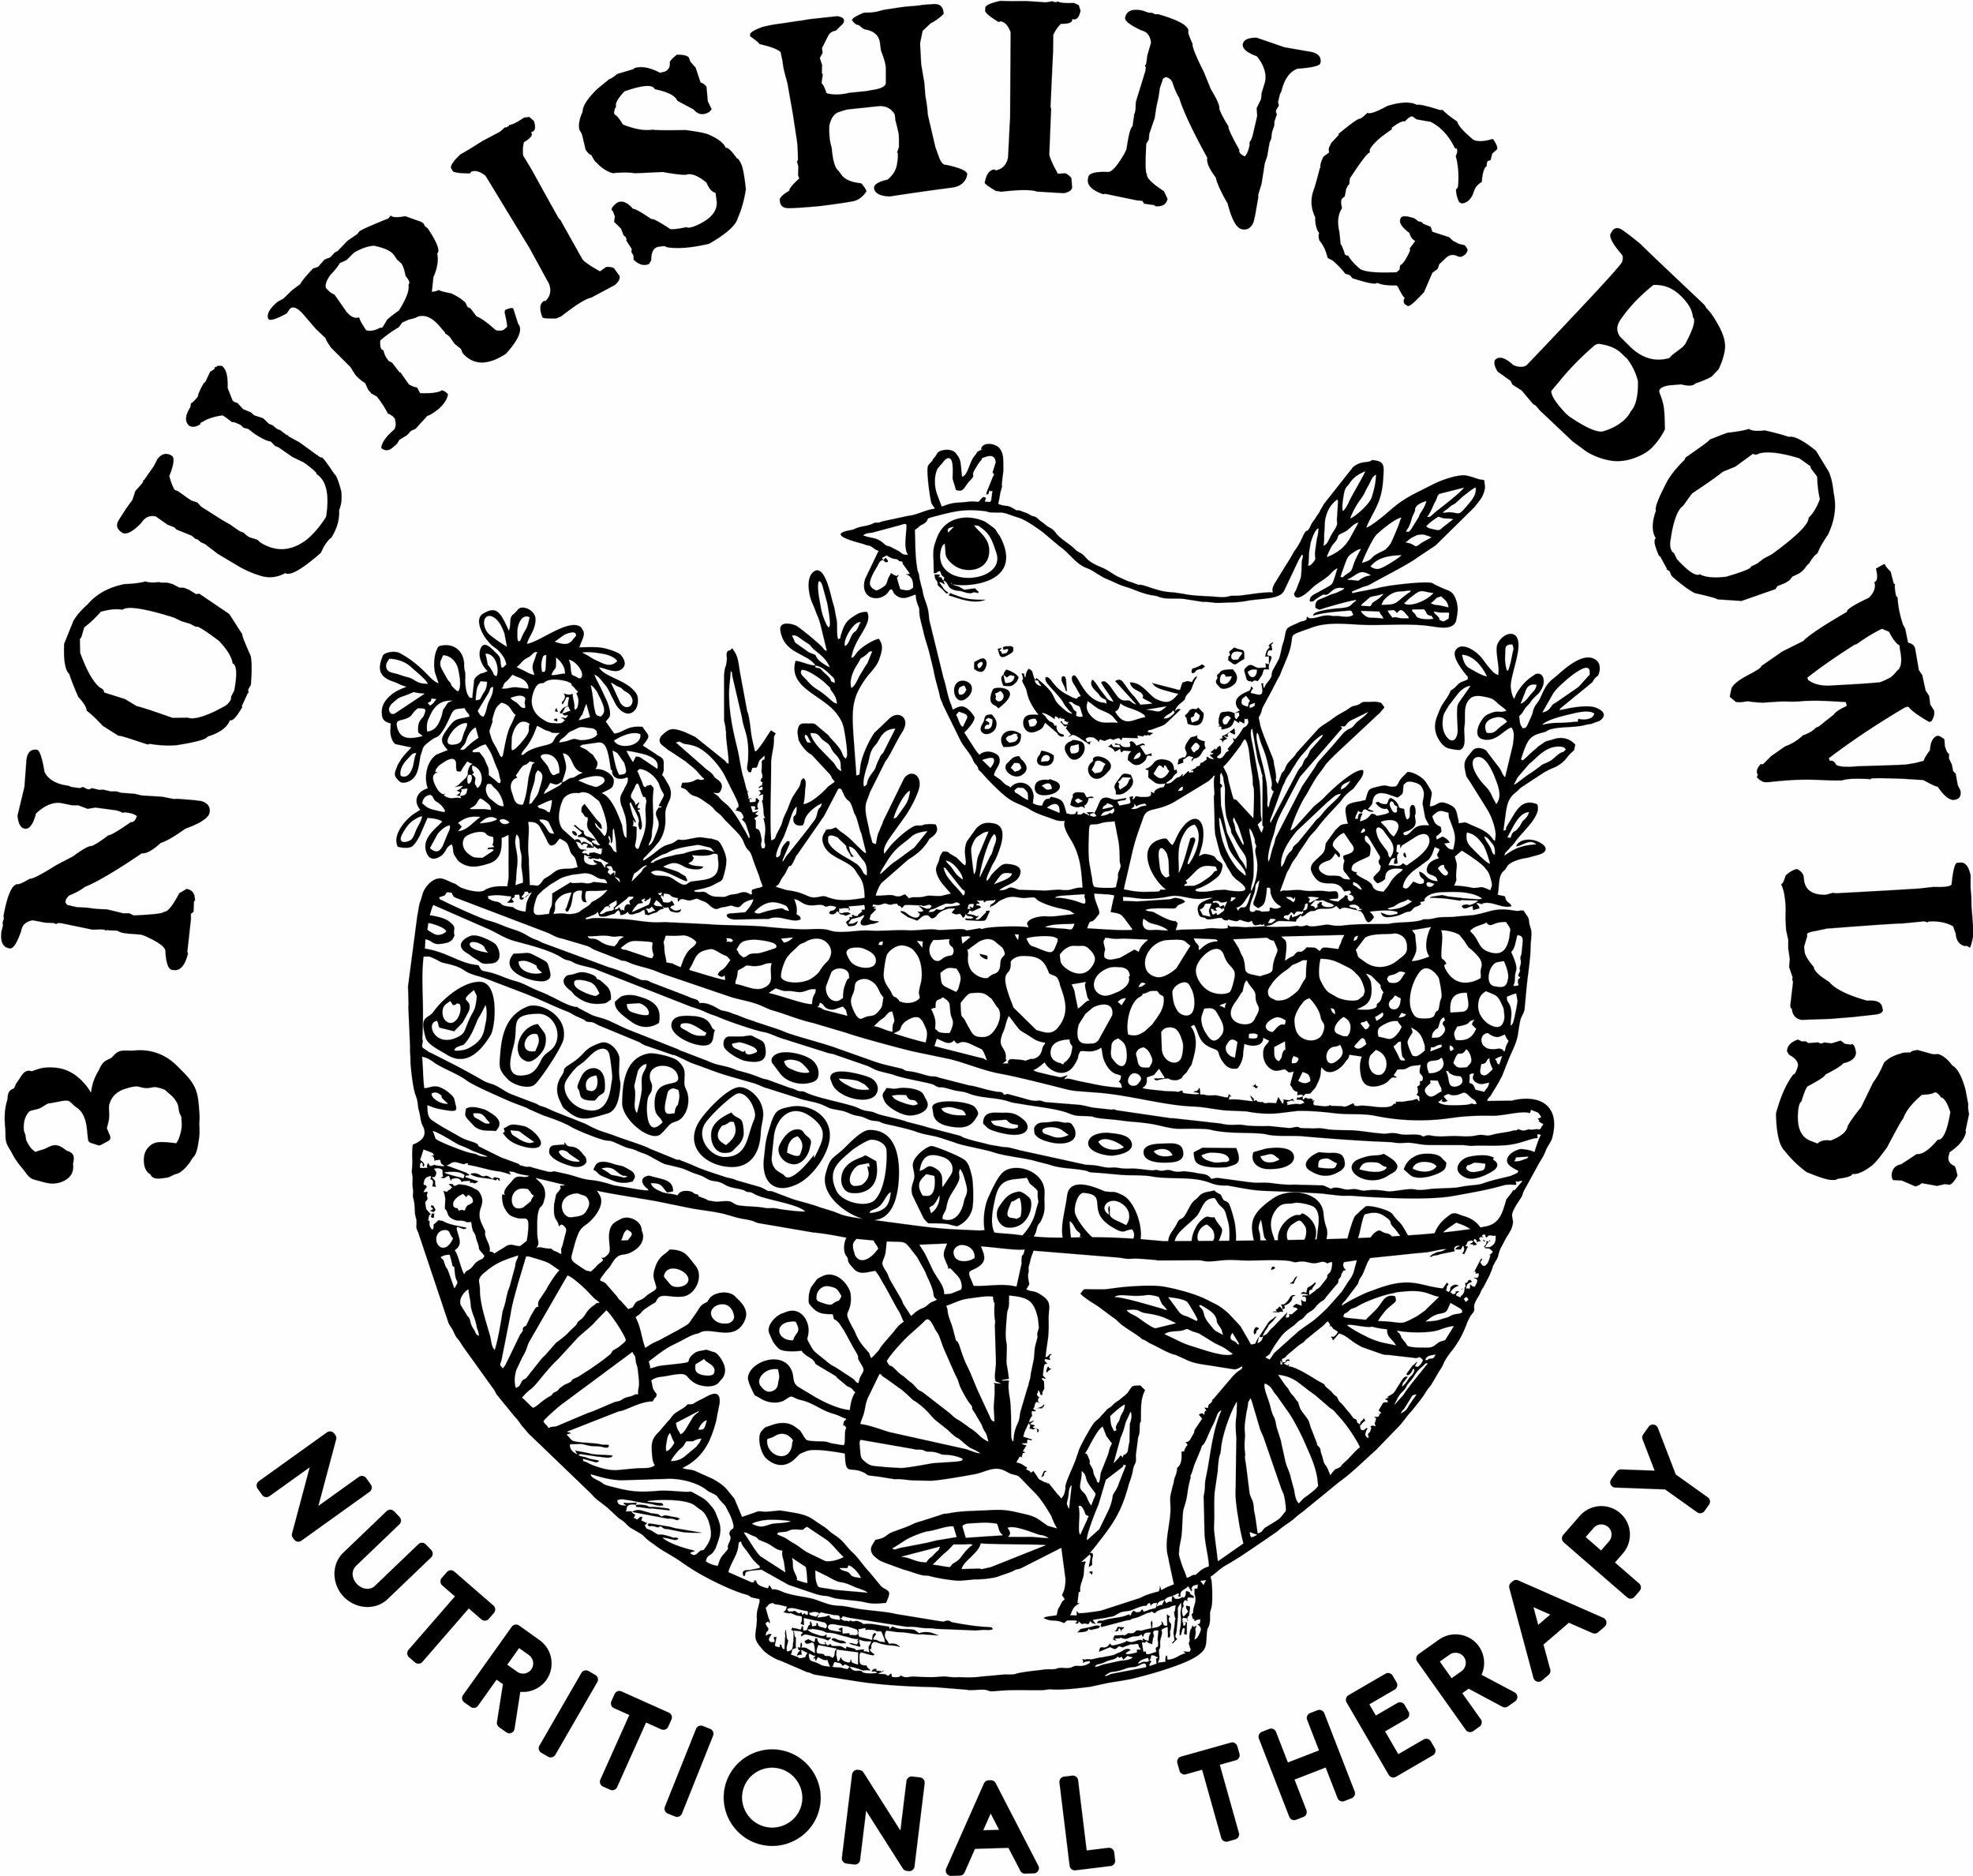 Email3nourishingbowls@gmail.com - Monday 9:30-5Tuesday 9:30-5Wednesday 9:30-6Thursday 9:30-5Friday 9:30-5Saturday: ClosedSunday: Closed